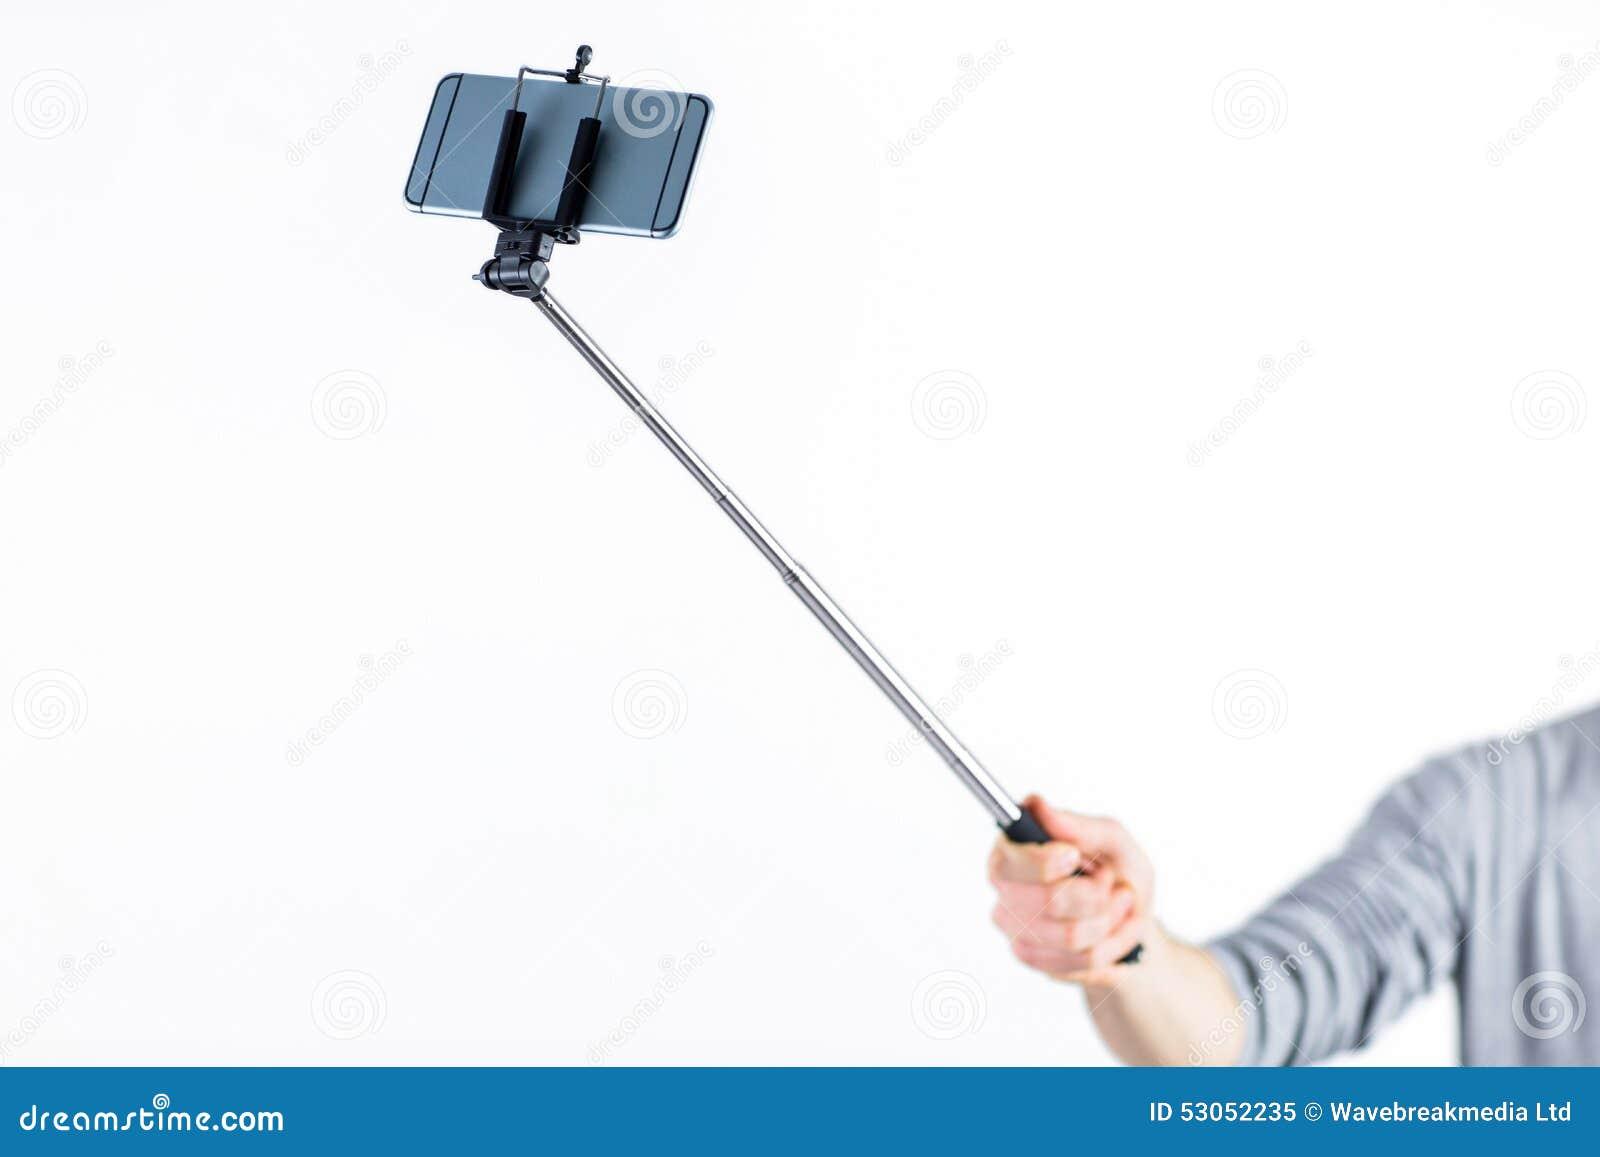 casual man using a selfie stick stock photo image 53052235. Black Bedroom Furniture Sets. Home Design Ideas